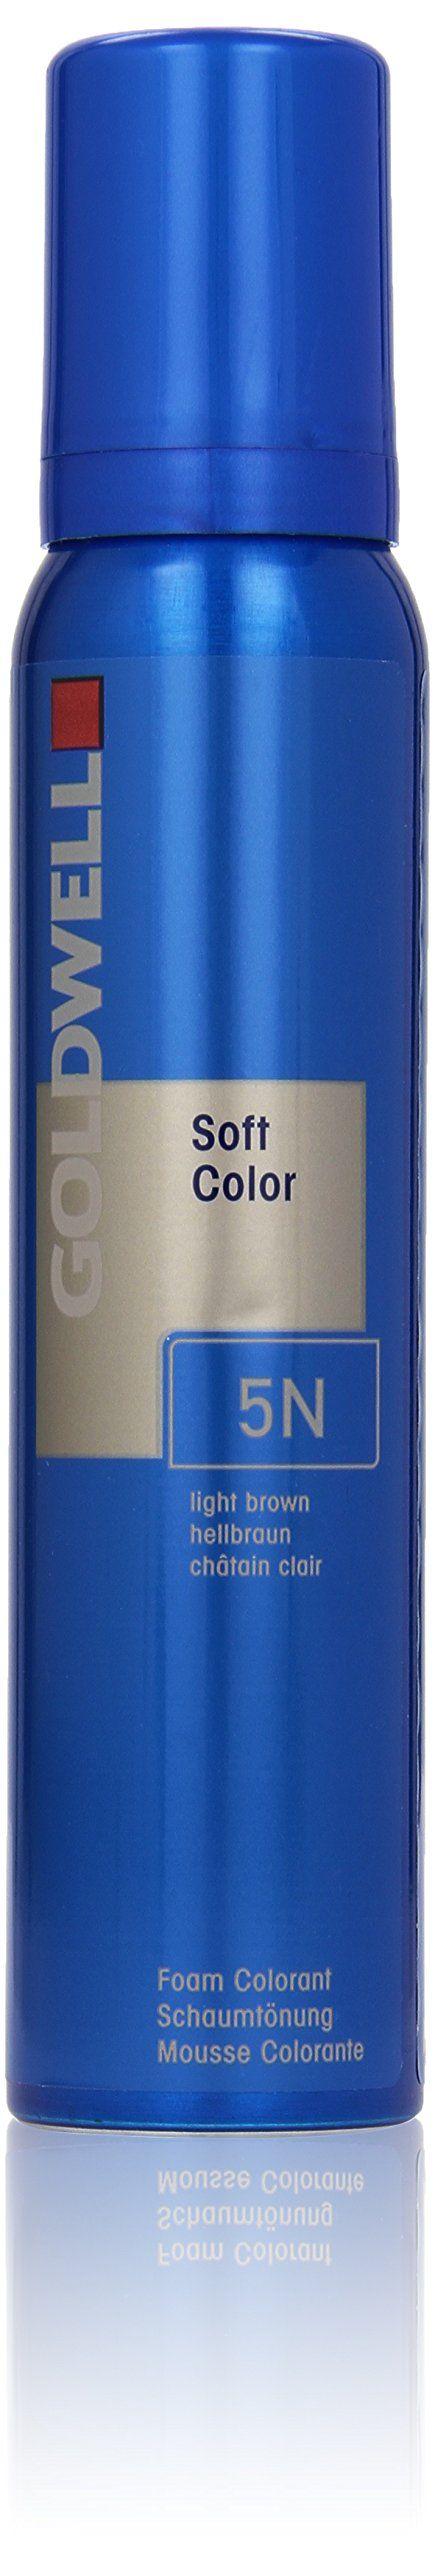 goldwell colorance soft color foam colorant 5n light brown color brown - Colorant Semi Permanent